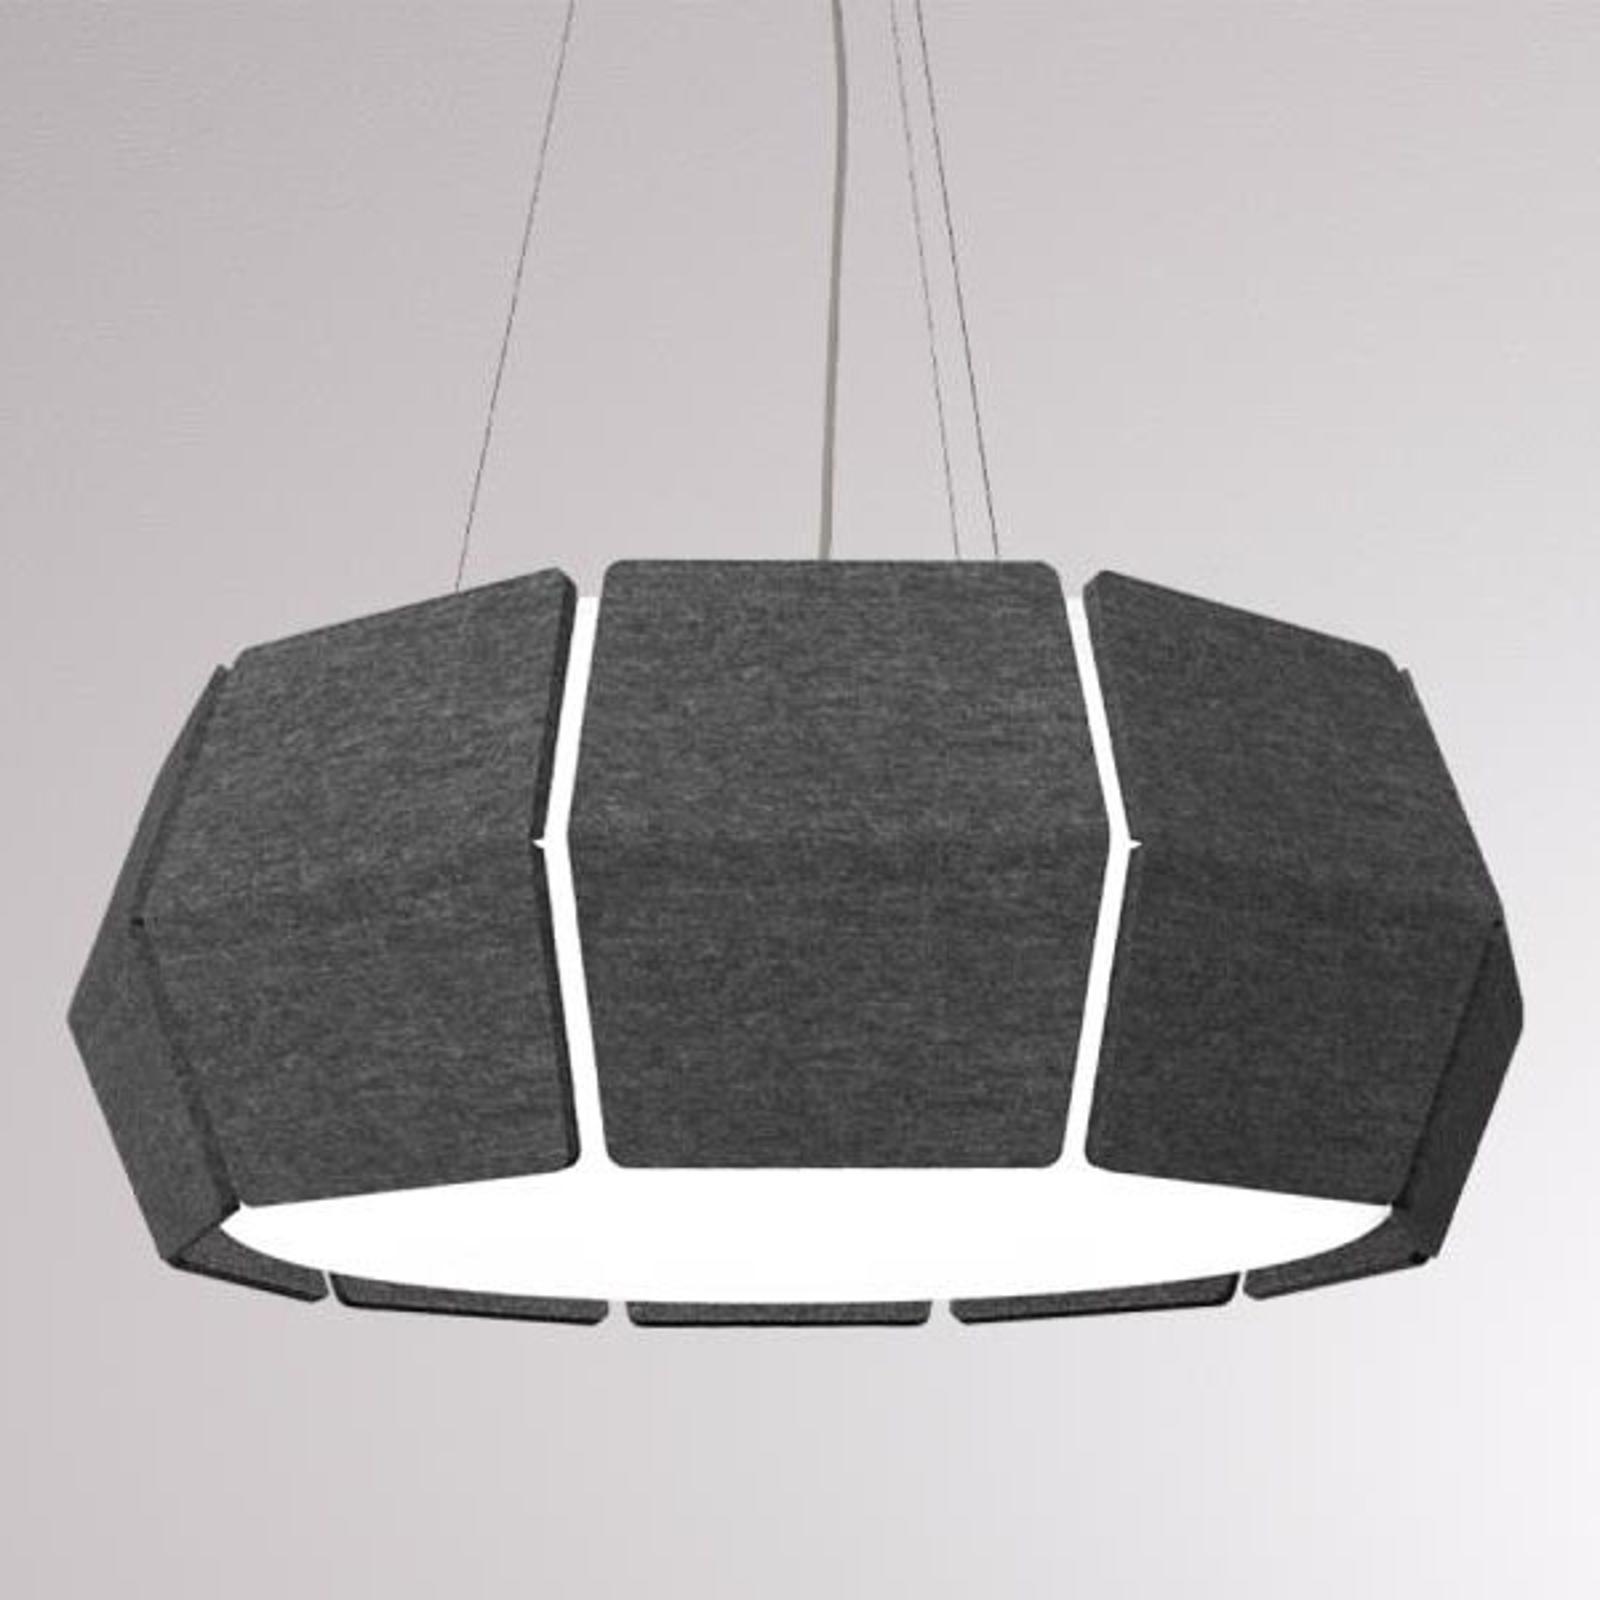 LOUM Decafelt LED hanglamp zwart Ø 54 cm